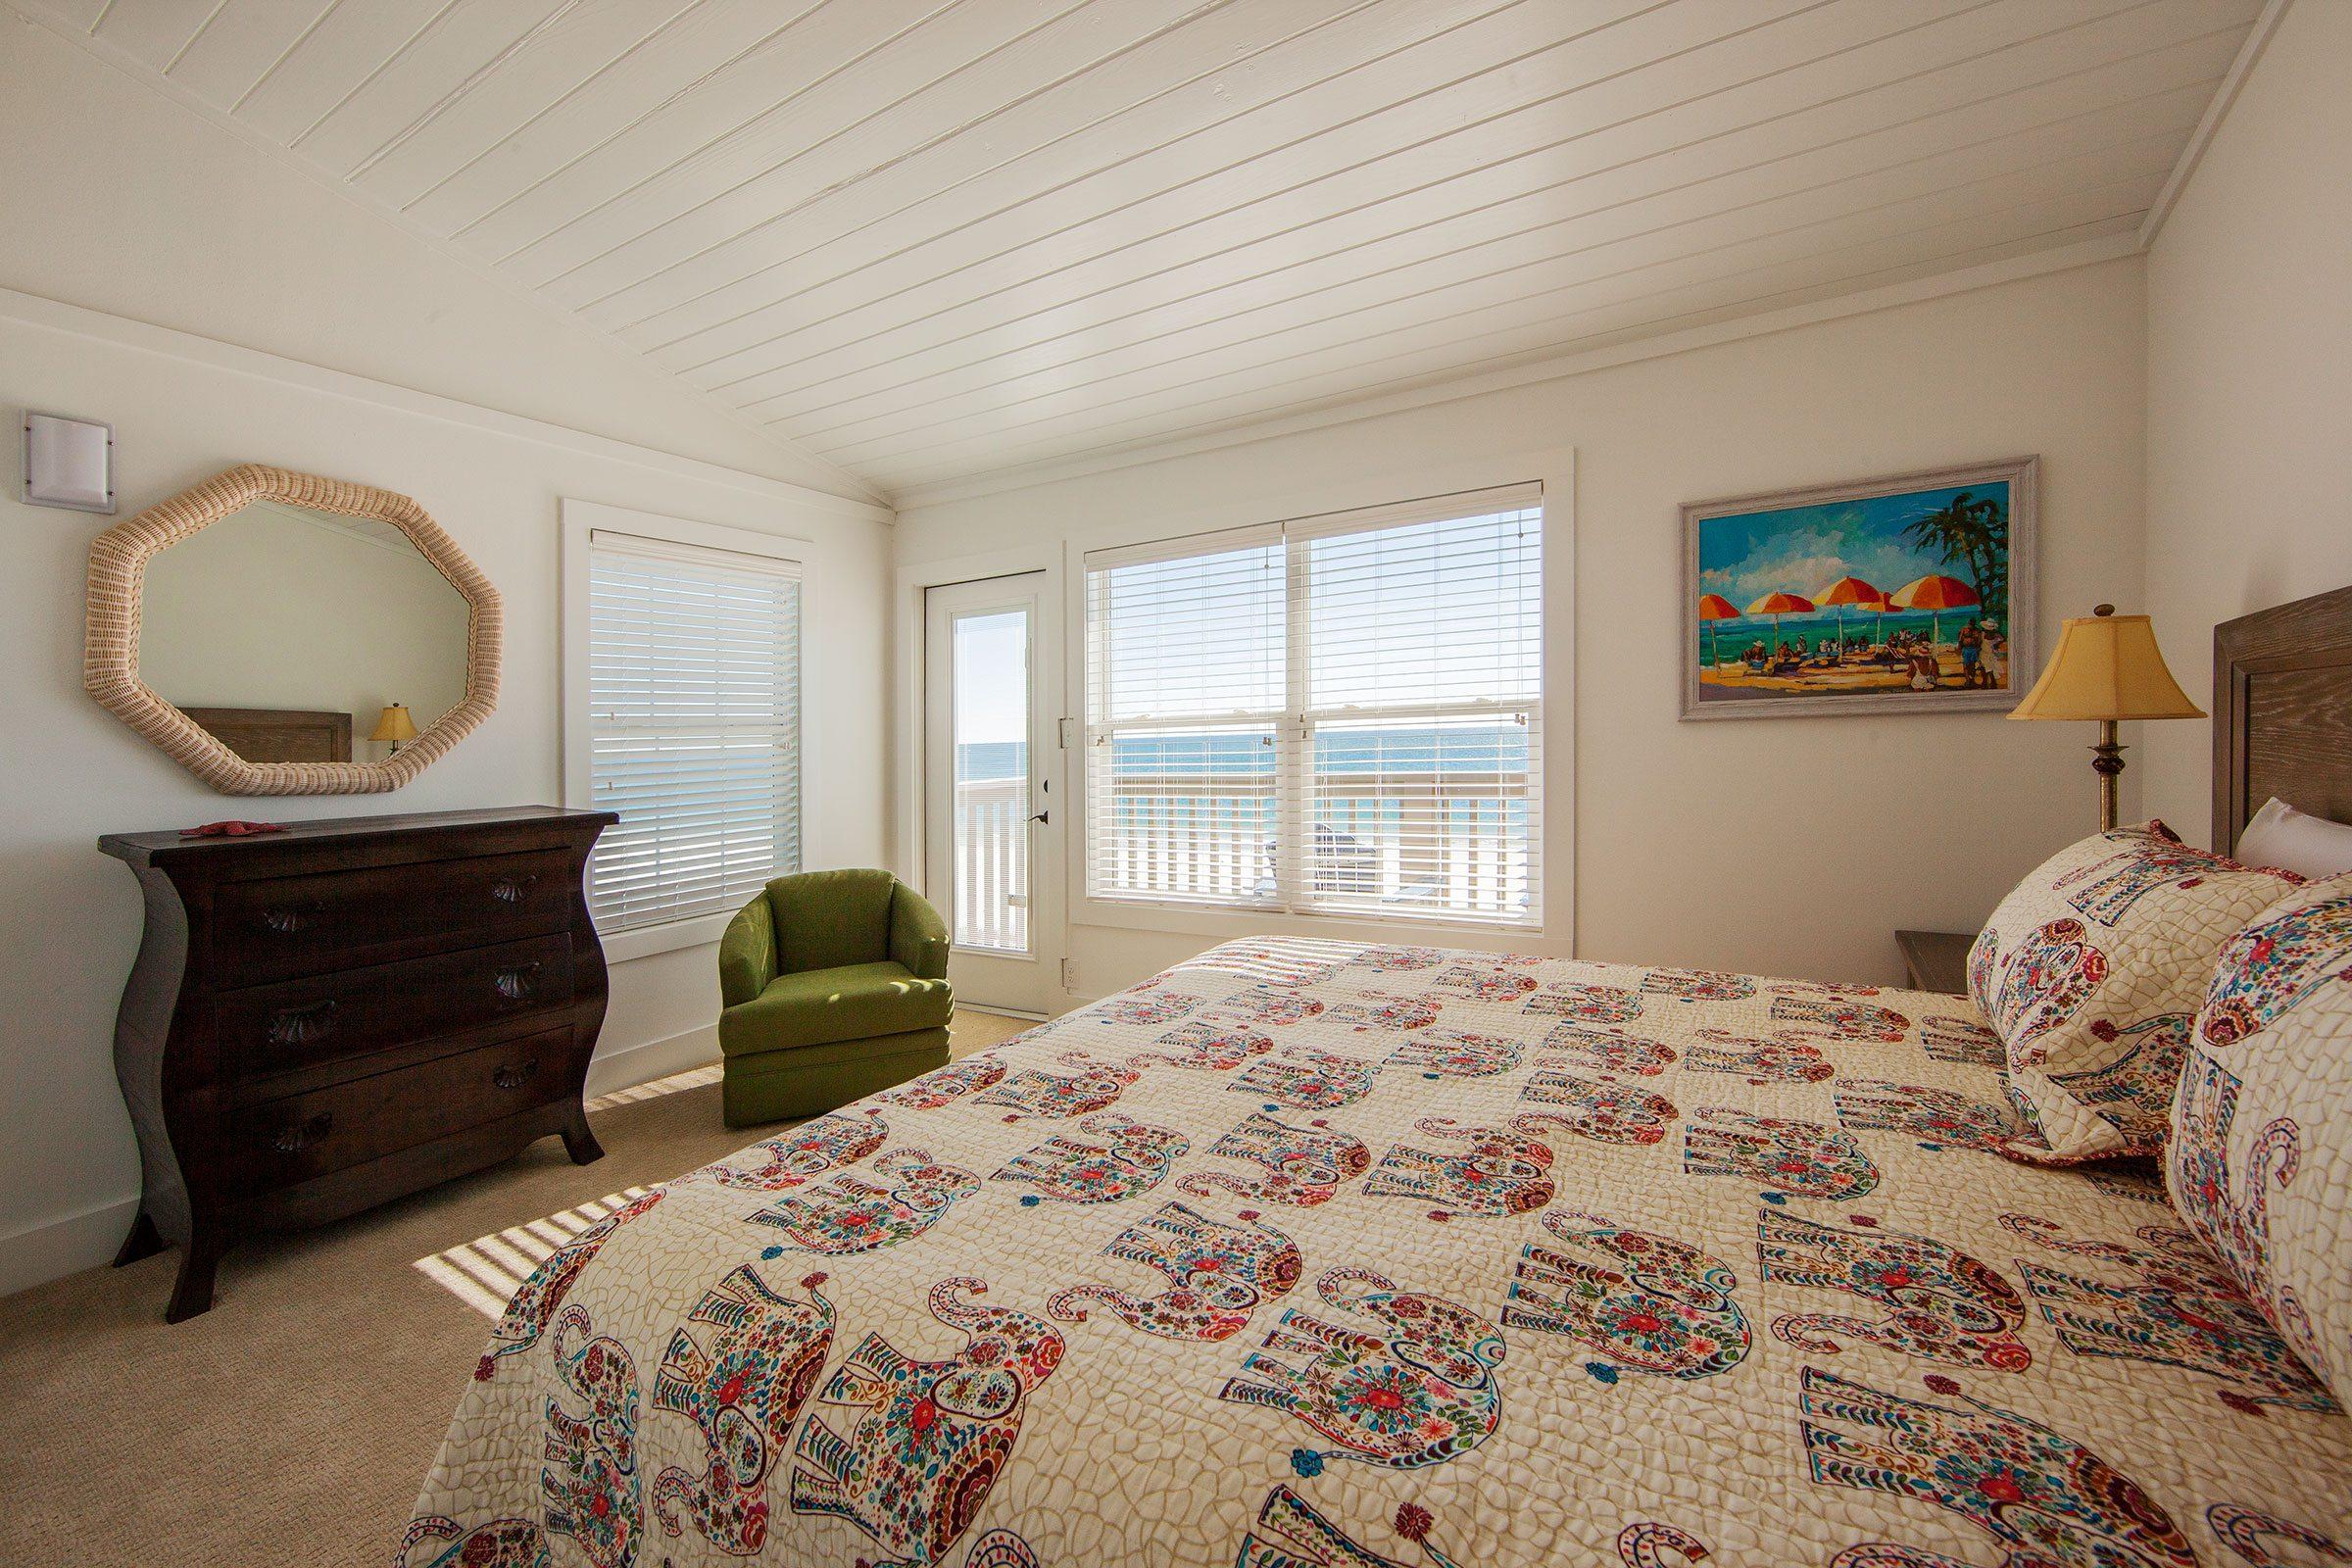 Summer Winds East 3rd Fl Beachside Bedroom 1 On Gulf Shores